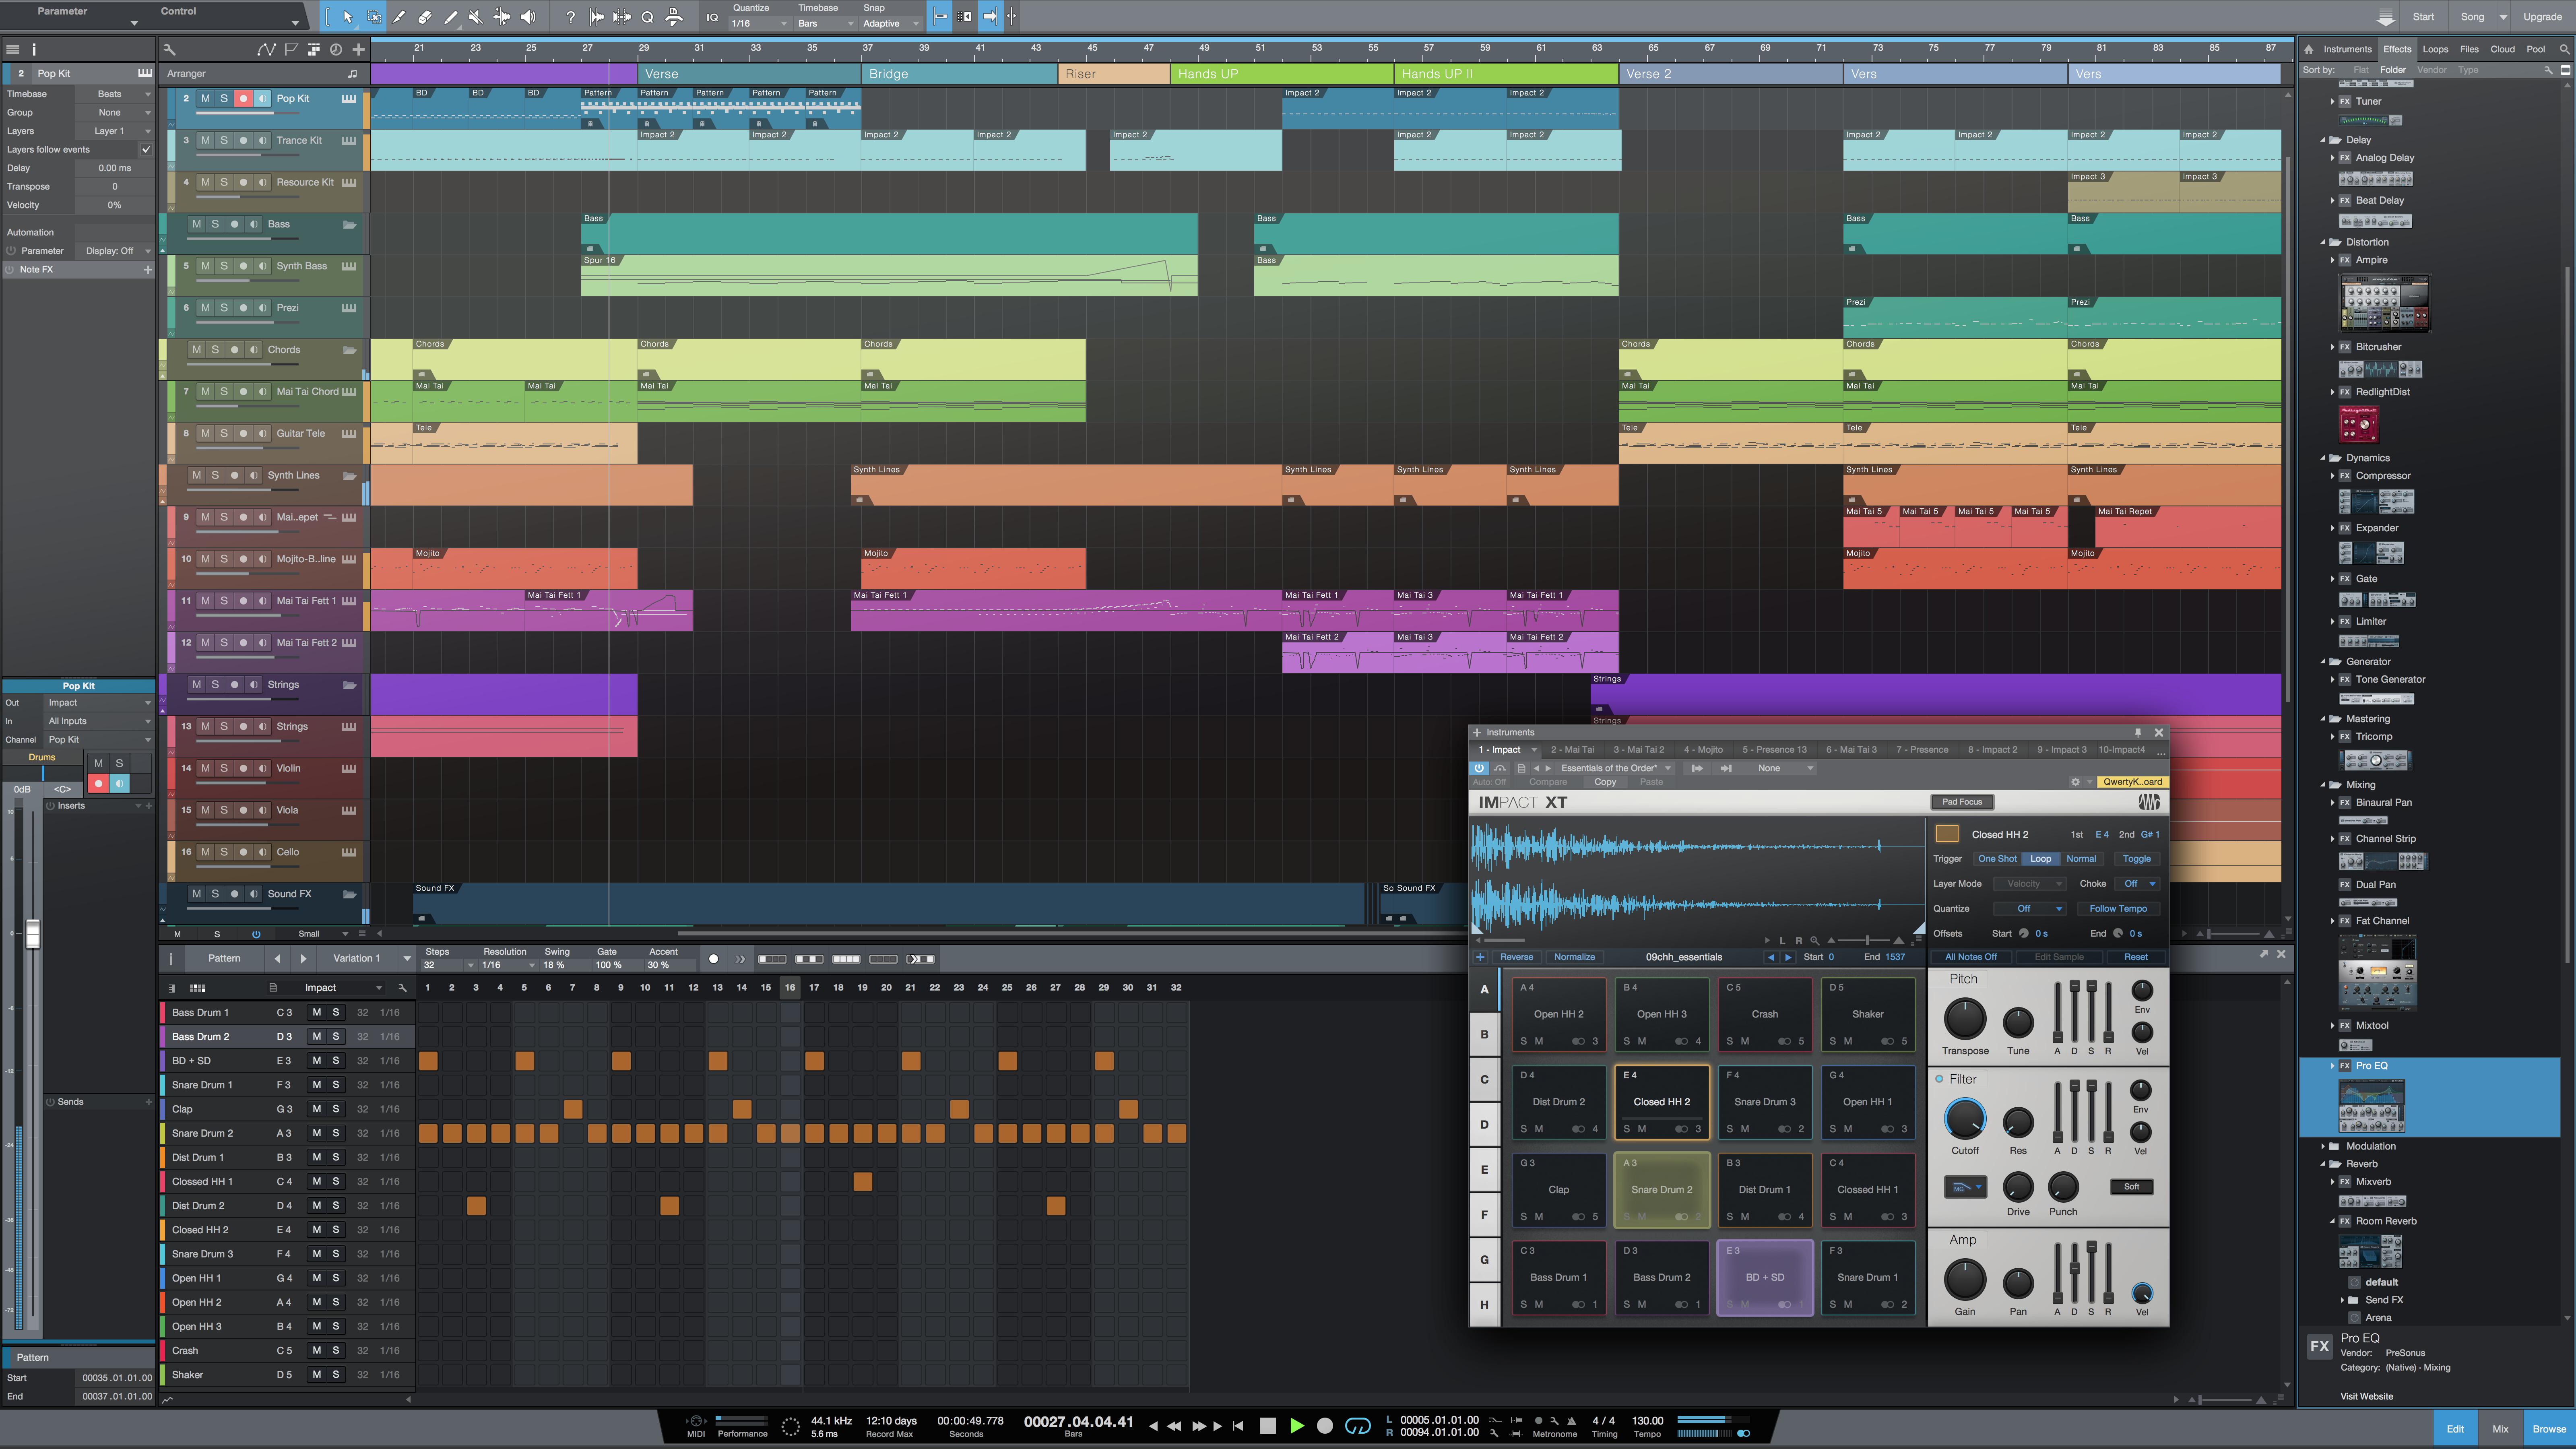 PreSonus Studio One 4 Artist Recording Software